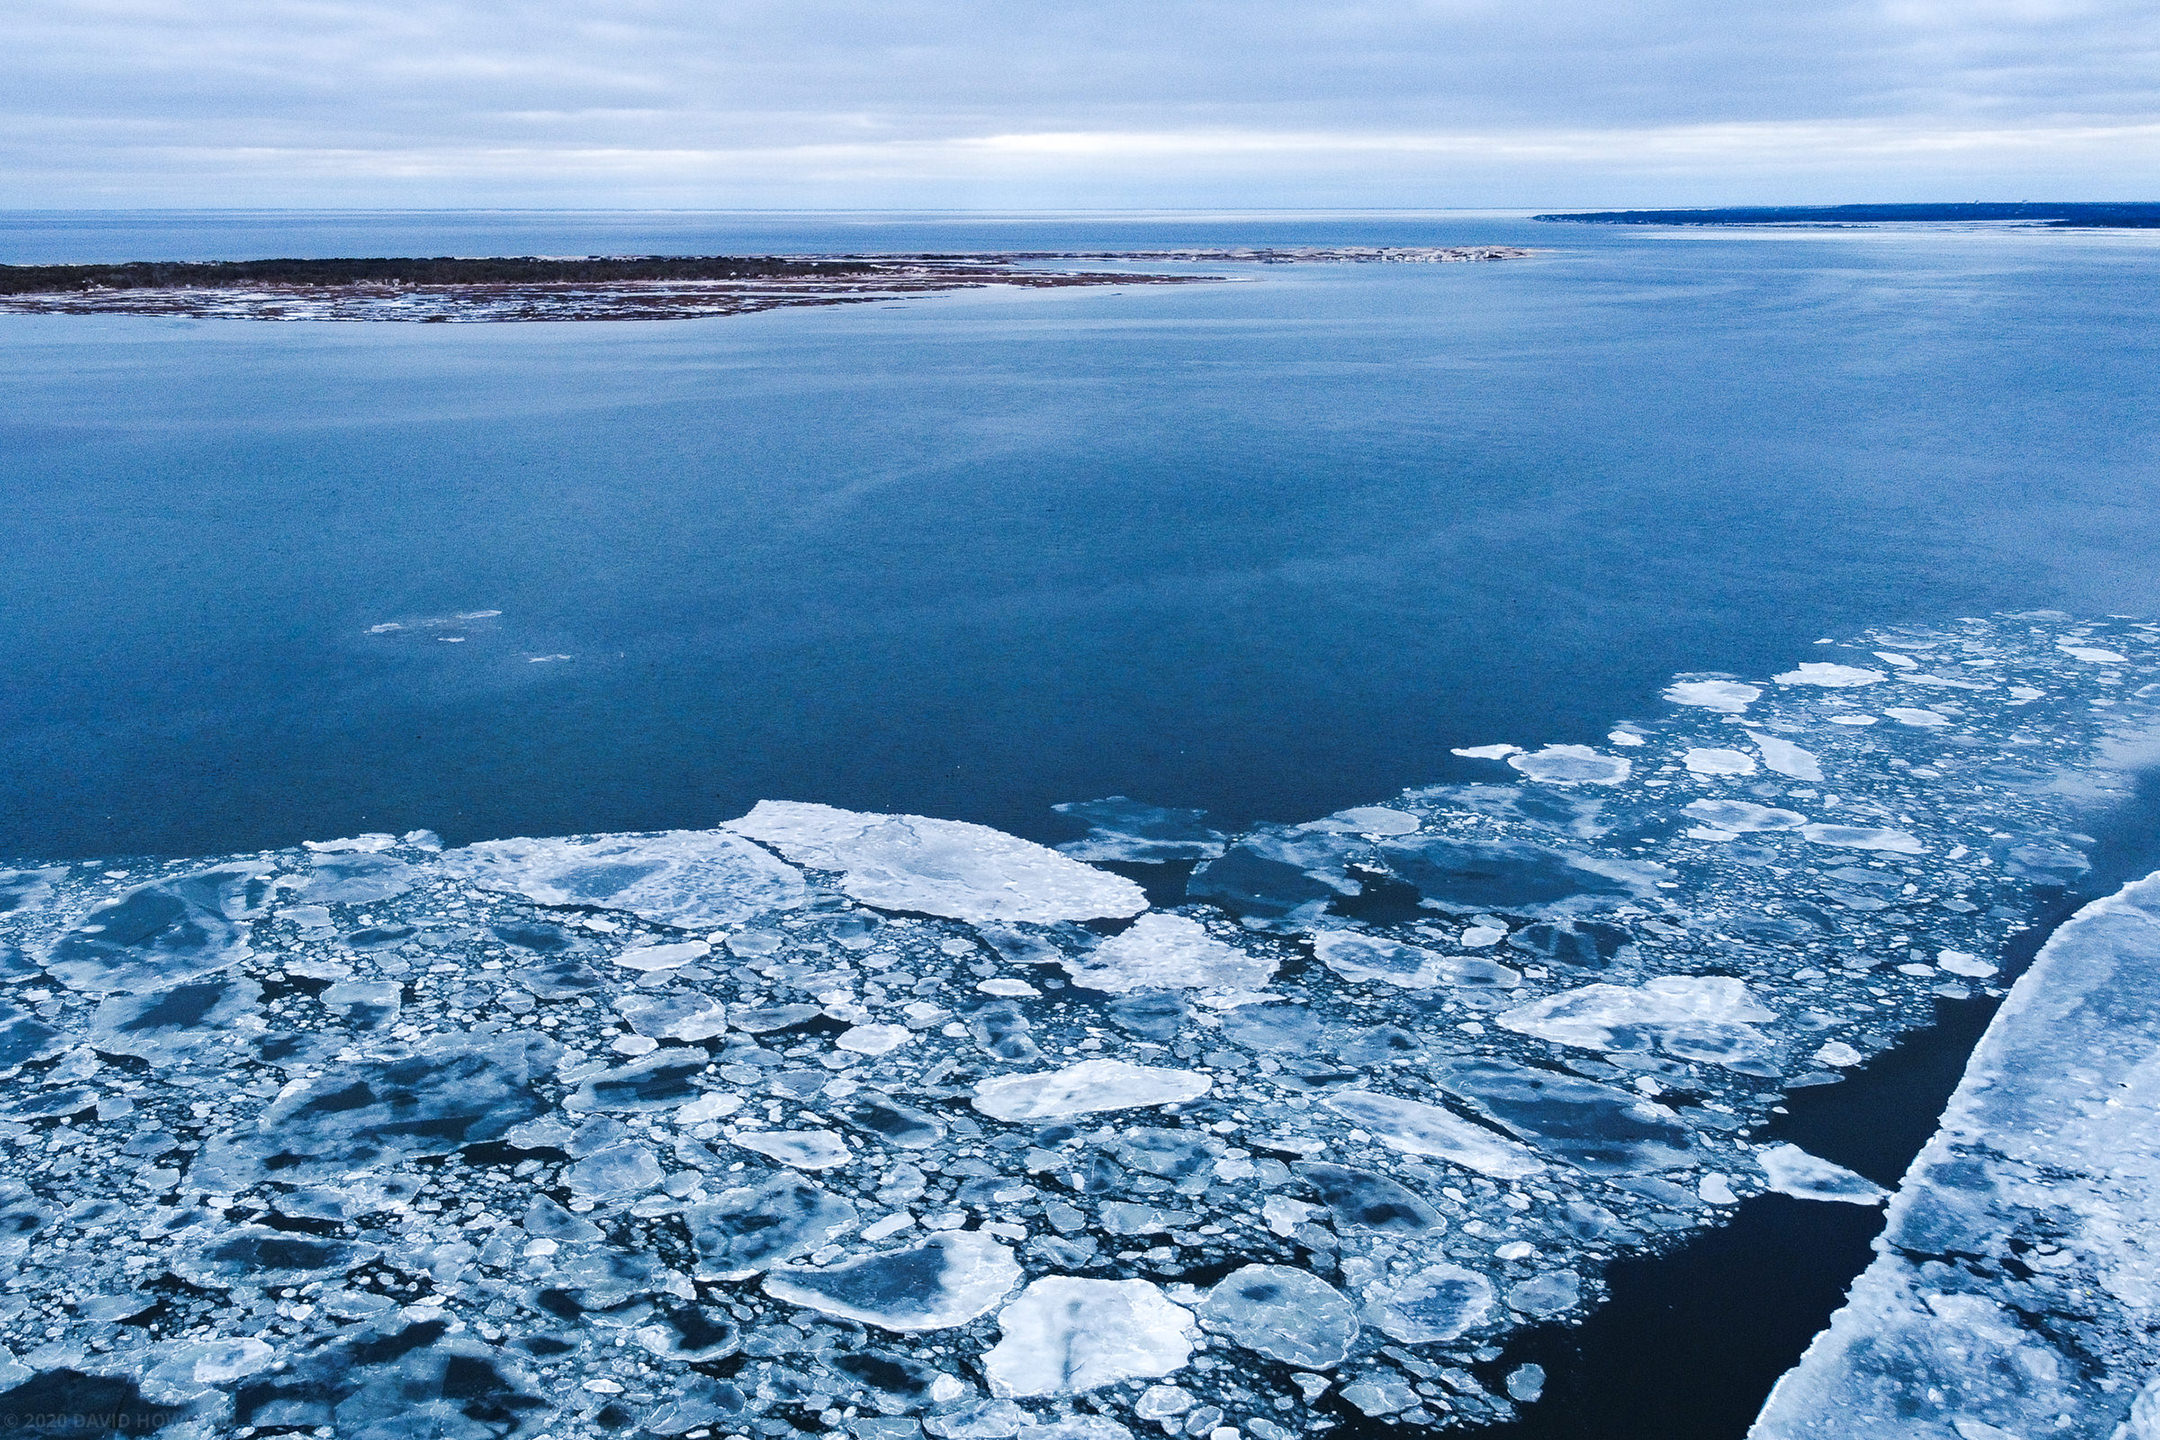 Sea Ice on Cape Cod Bay